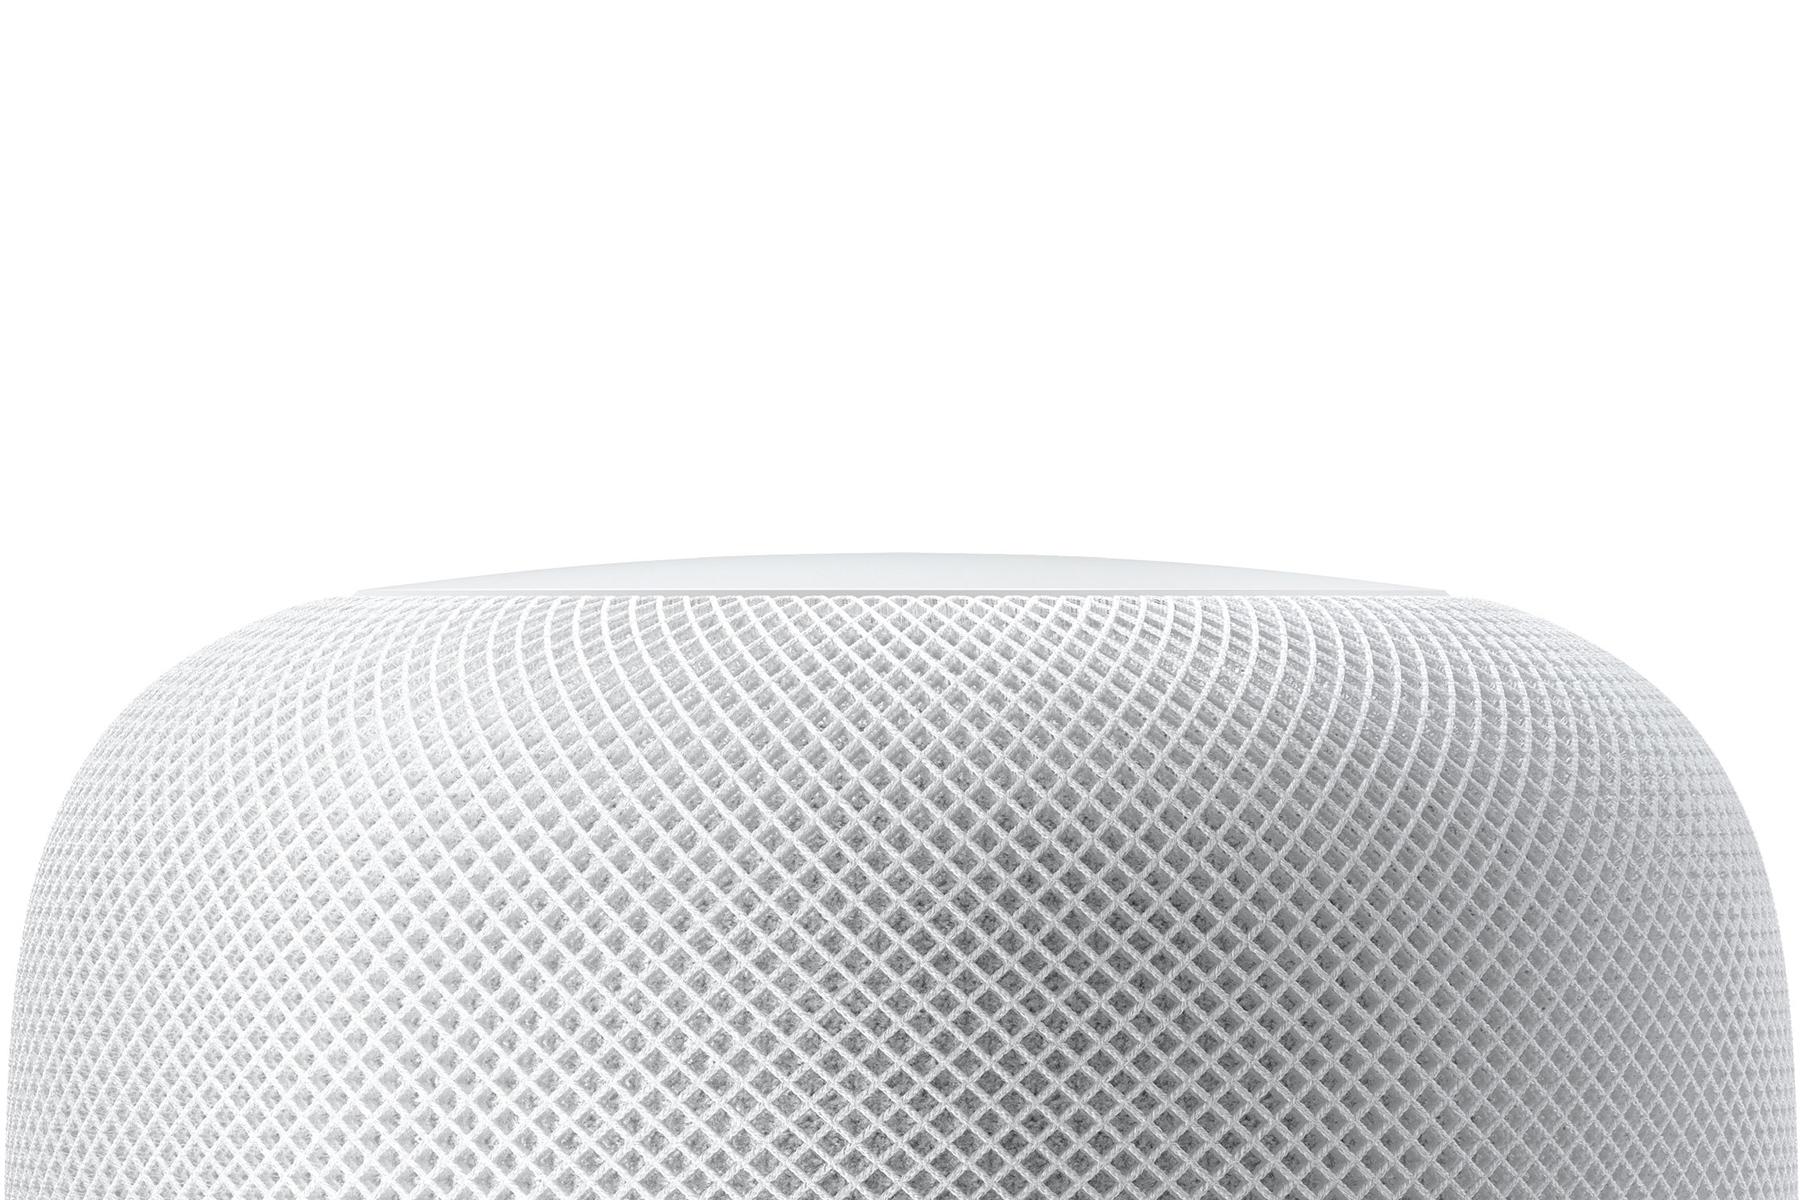 apple-homepod-wireless-speaker-designboom-1800x.jpg